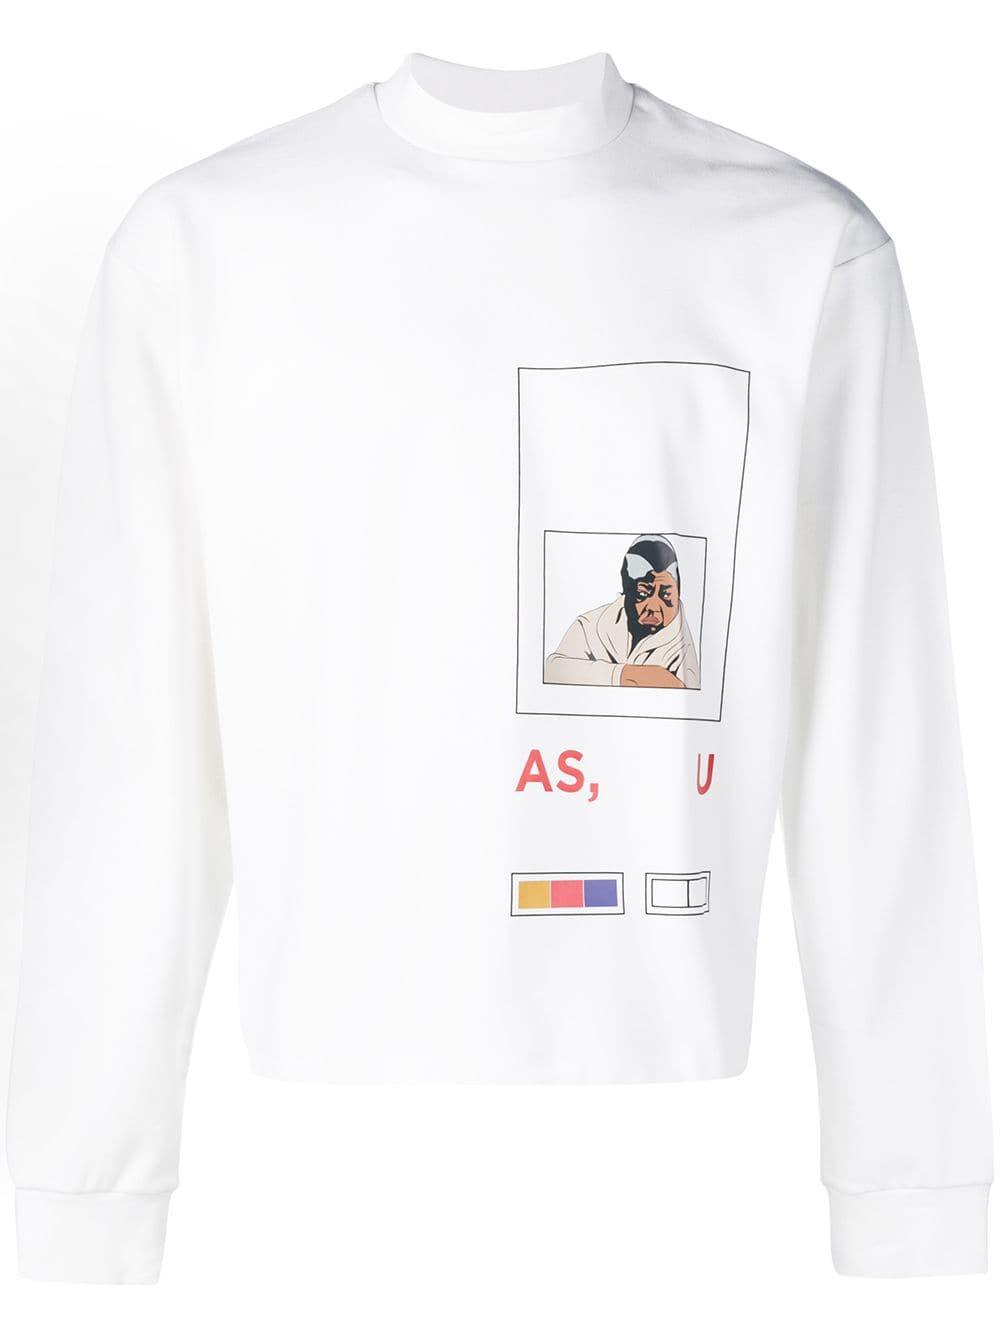 Pyer Moss Front Printed T Shirt Farfetch Print T Shirt T Shirt Moss Fashion [ 1334 x 1000 Pixel ]